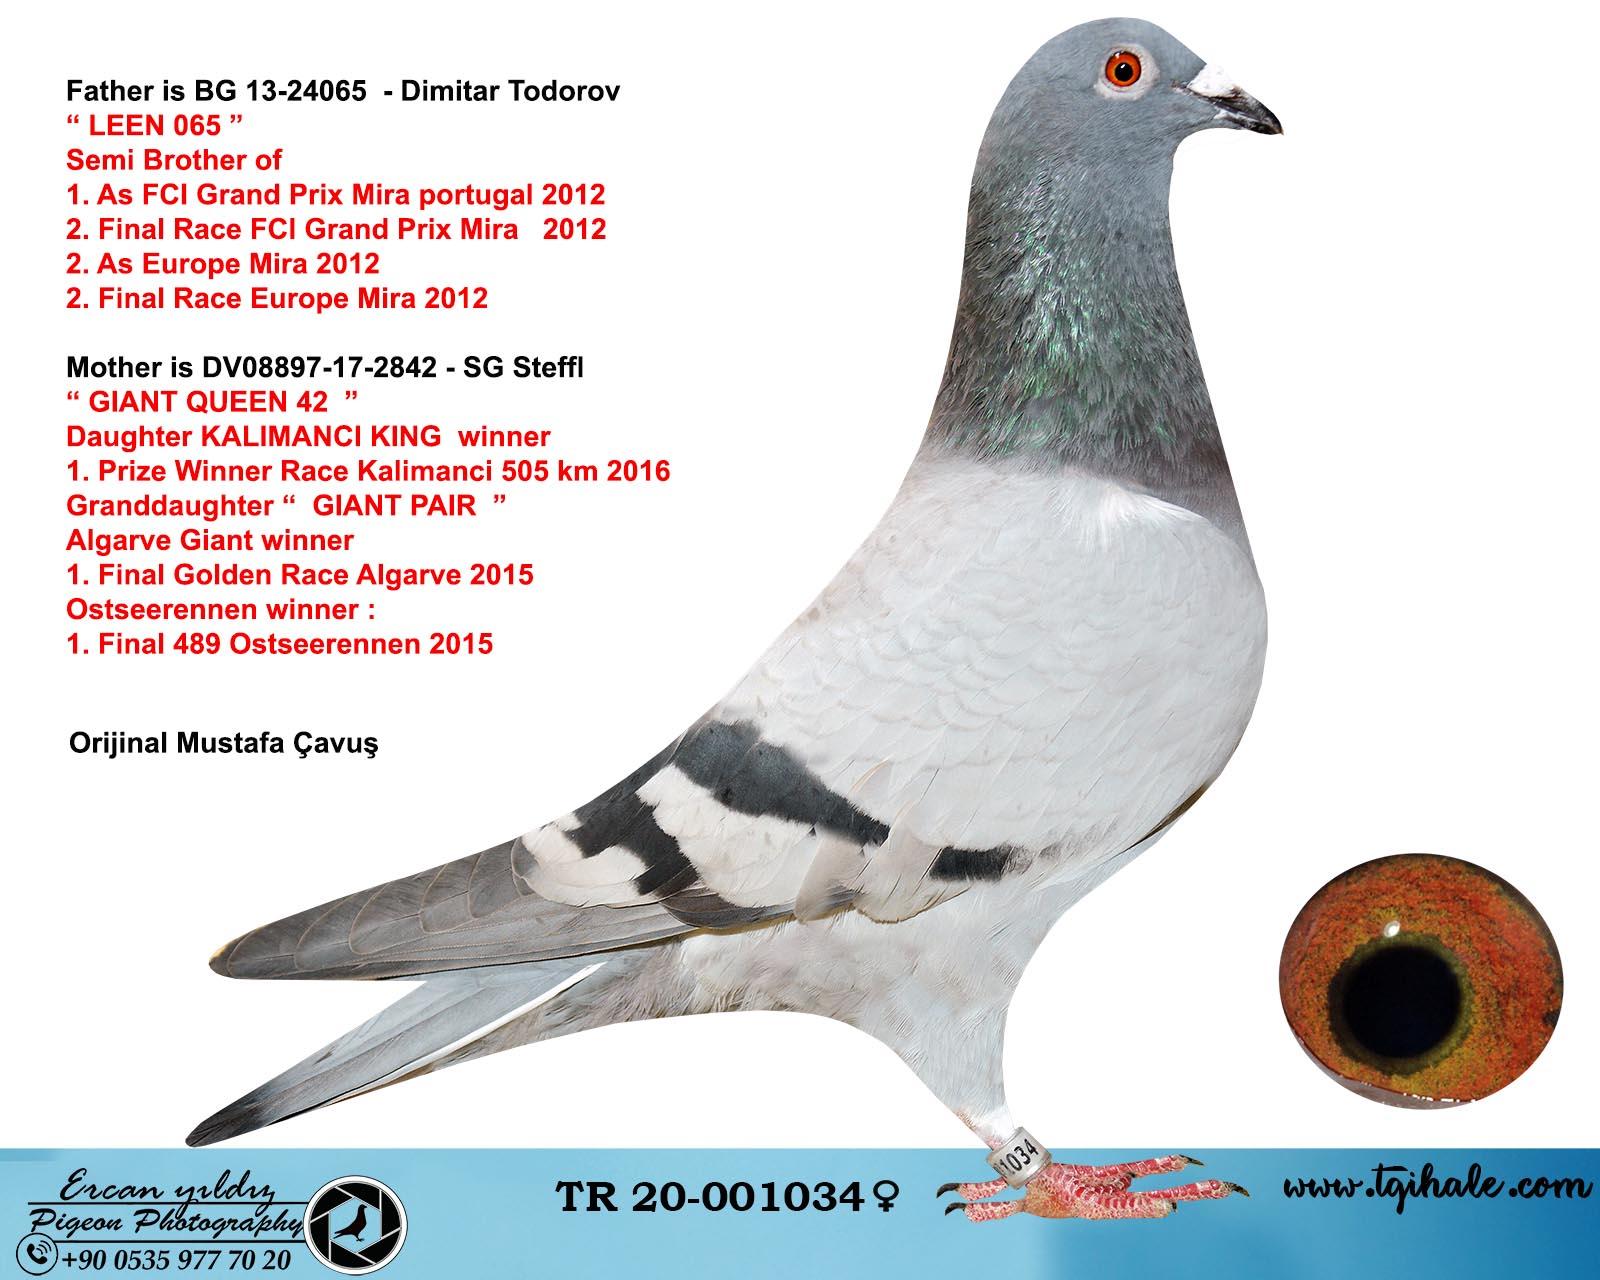 TR20-001034 DİŞİ / BABADI LEEN 739 OGLU ANNESİ KALİMANCİ SAMPIYONU KIZI